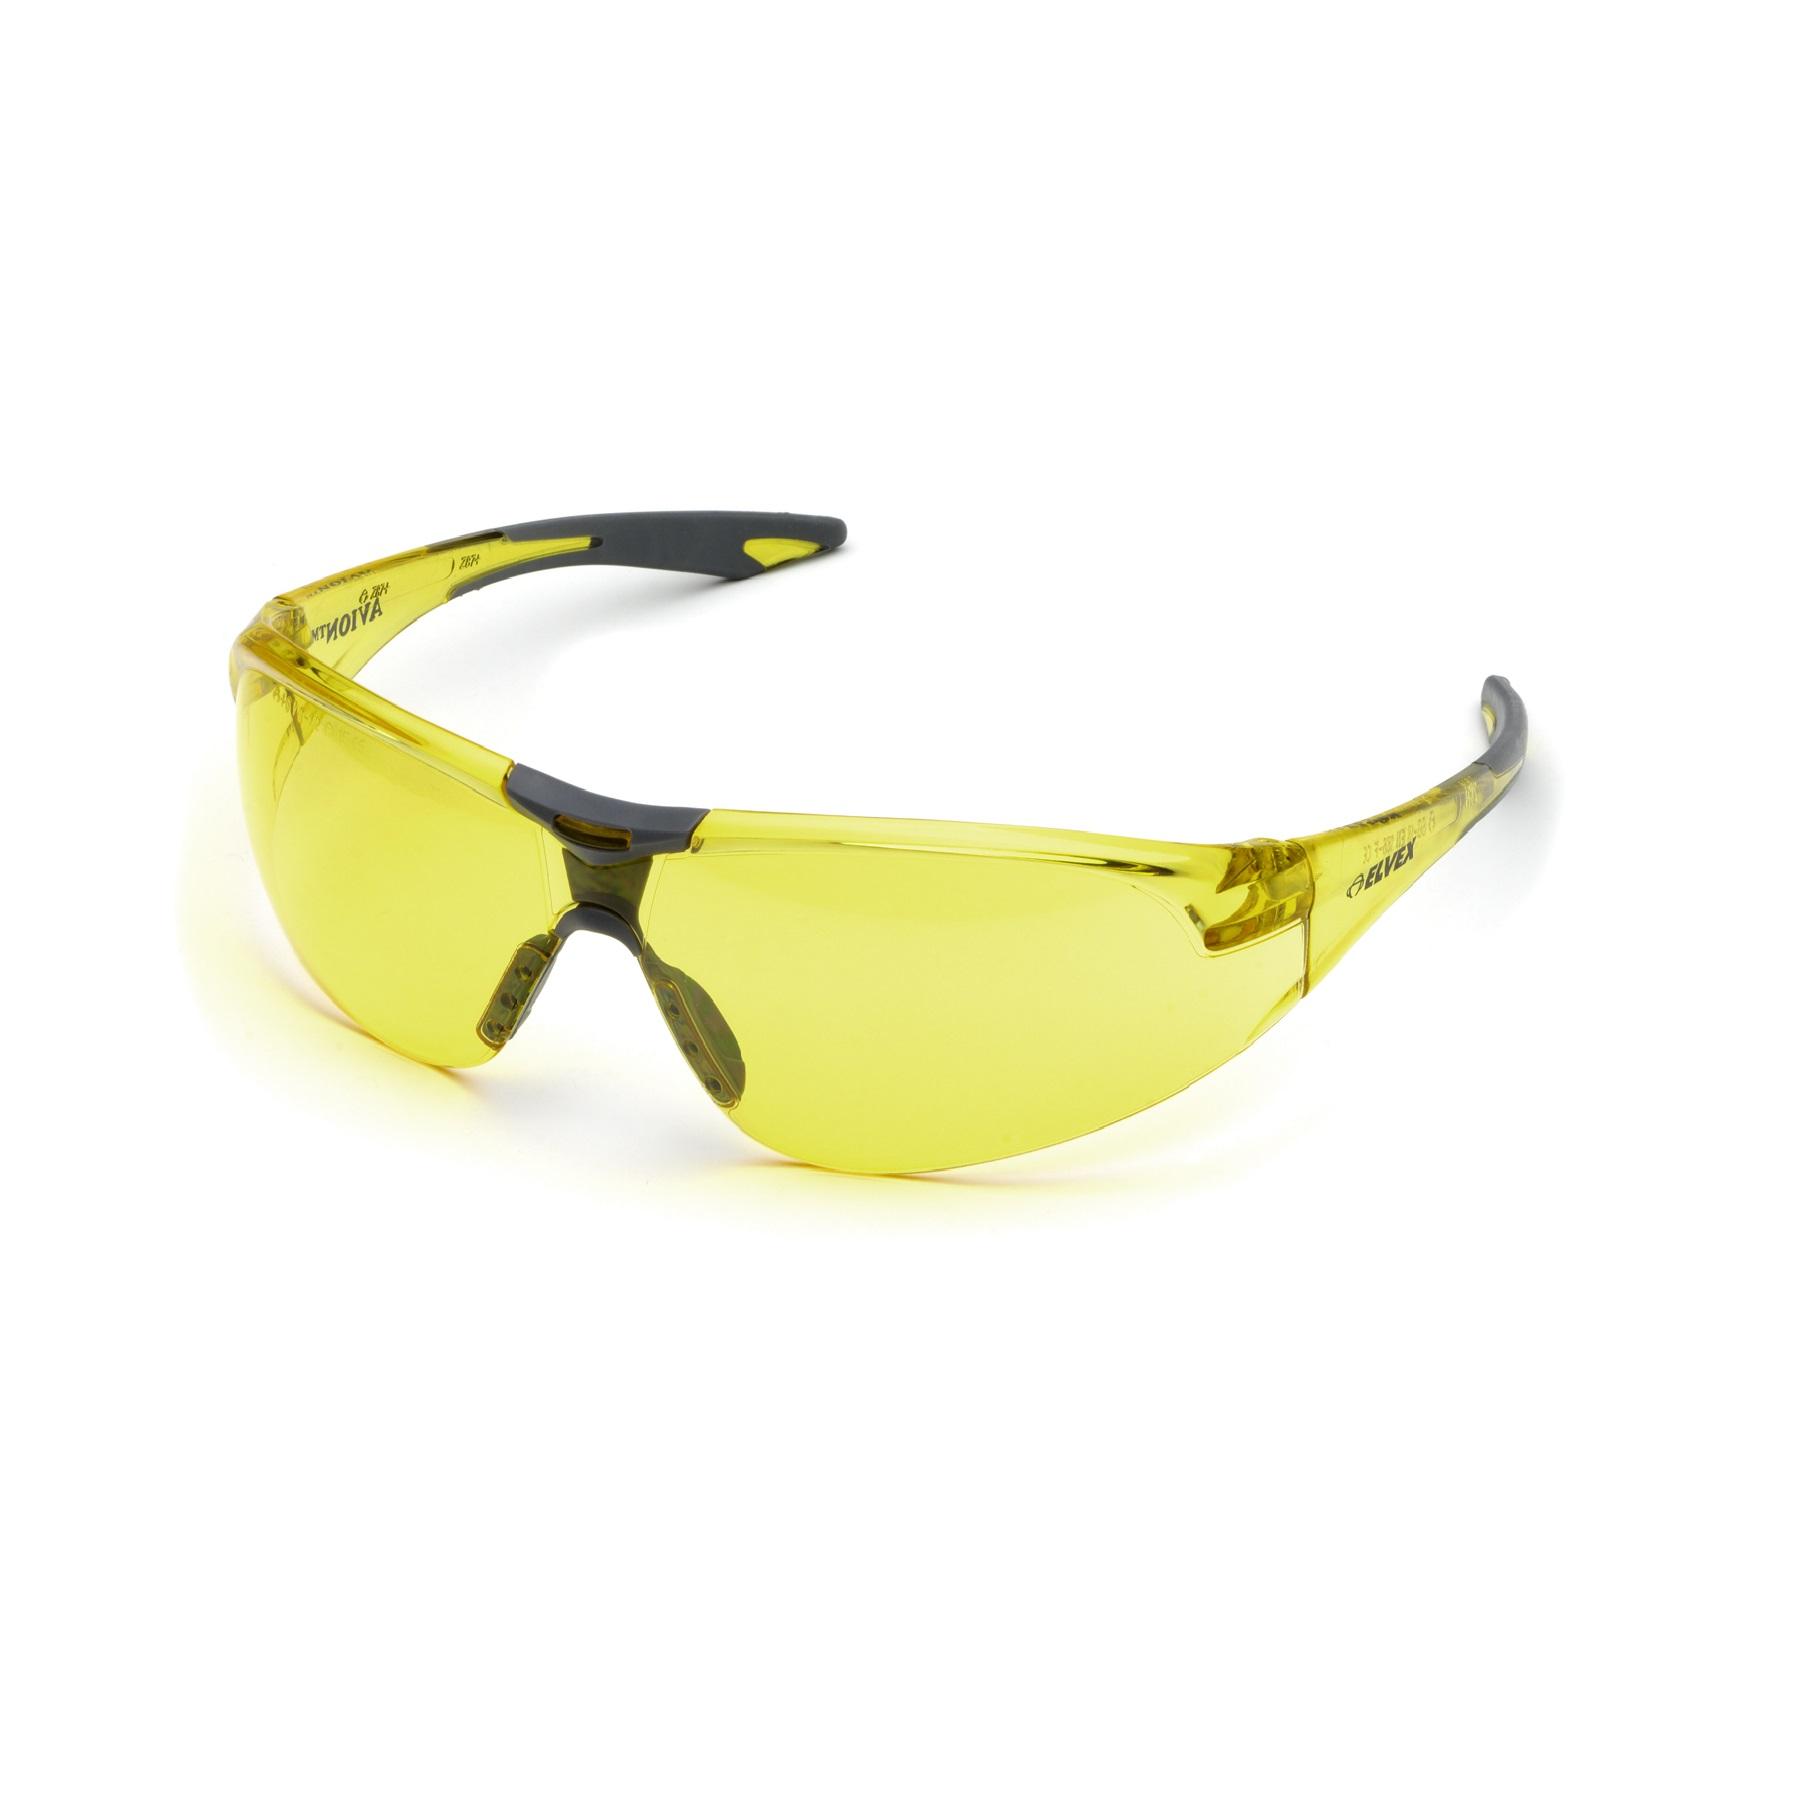 ea4f5812a3633 Elvex Avion Safety Glasses SG-18 - REPCON NW